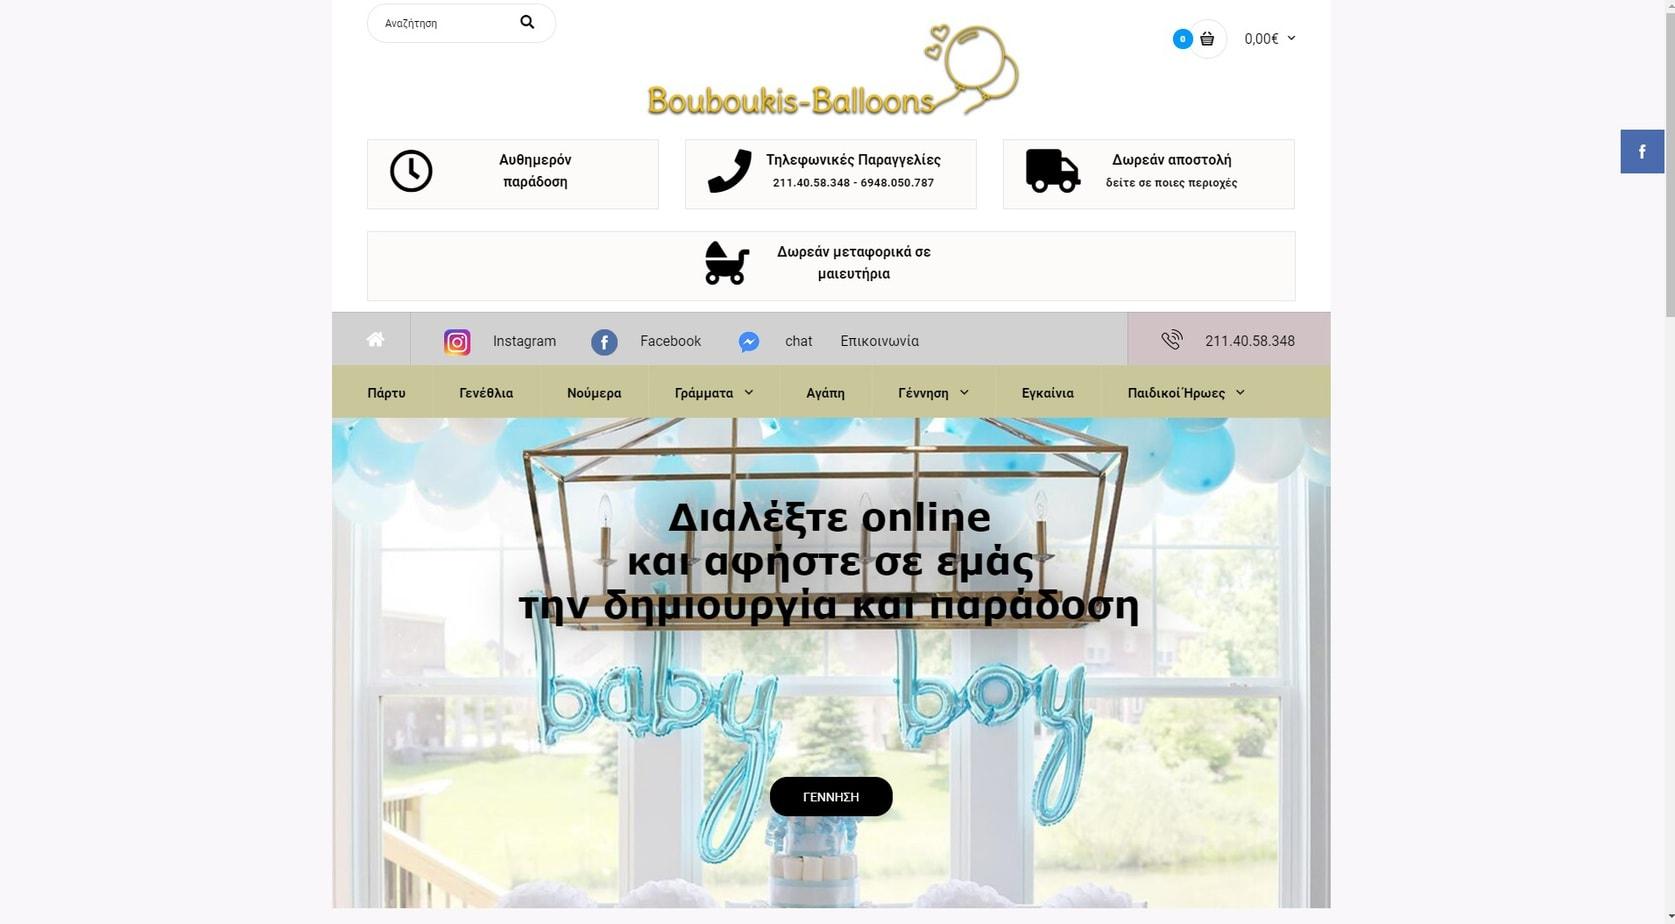 bouboukis_balloons_desktop